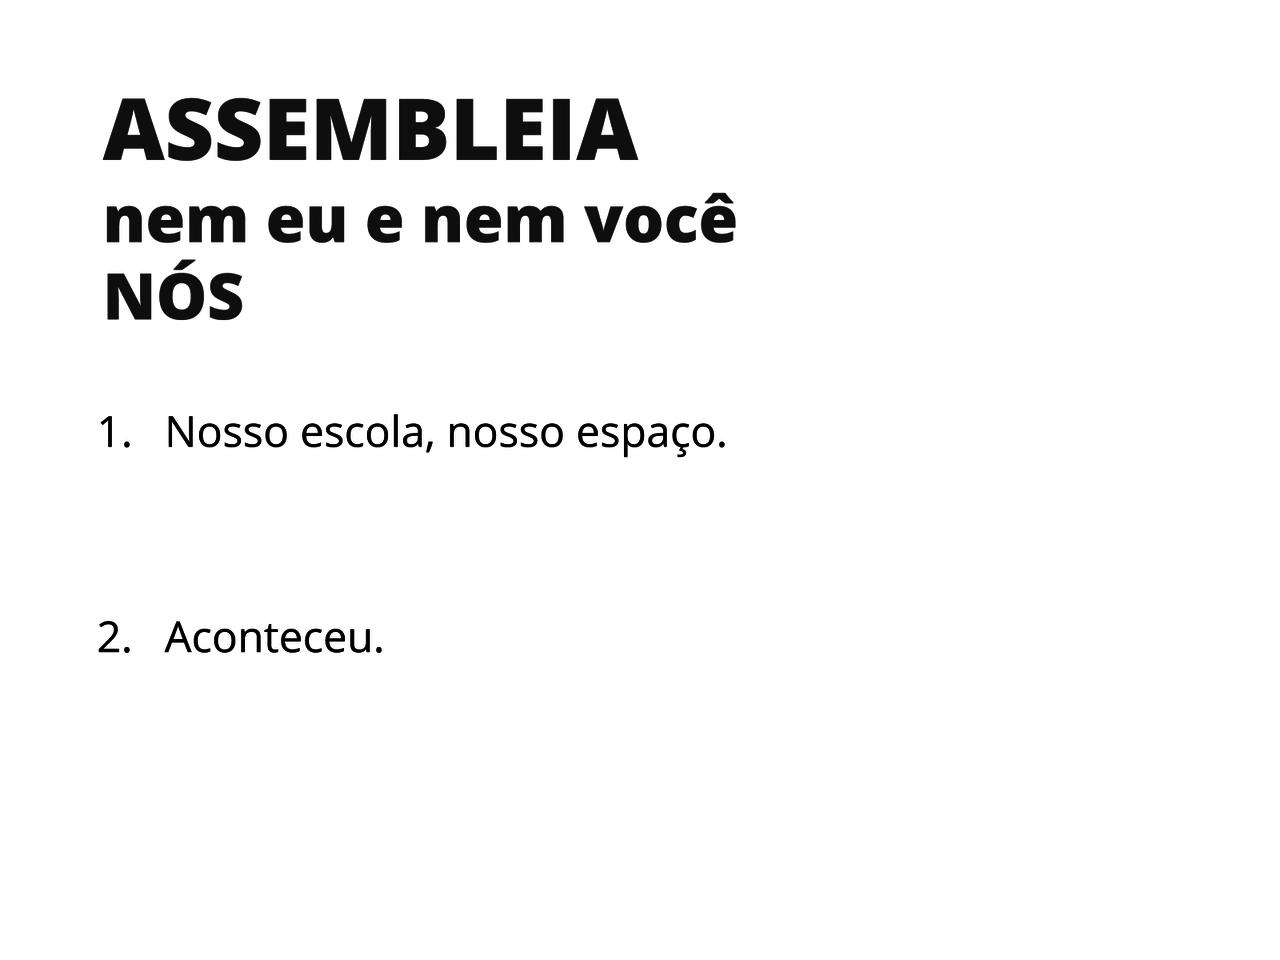 Plano De Aula 5º Ano Língua Portuguesa Assembleia